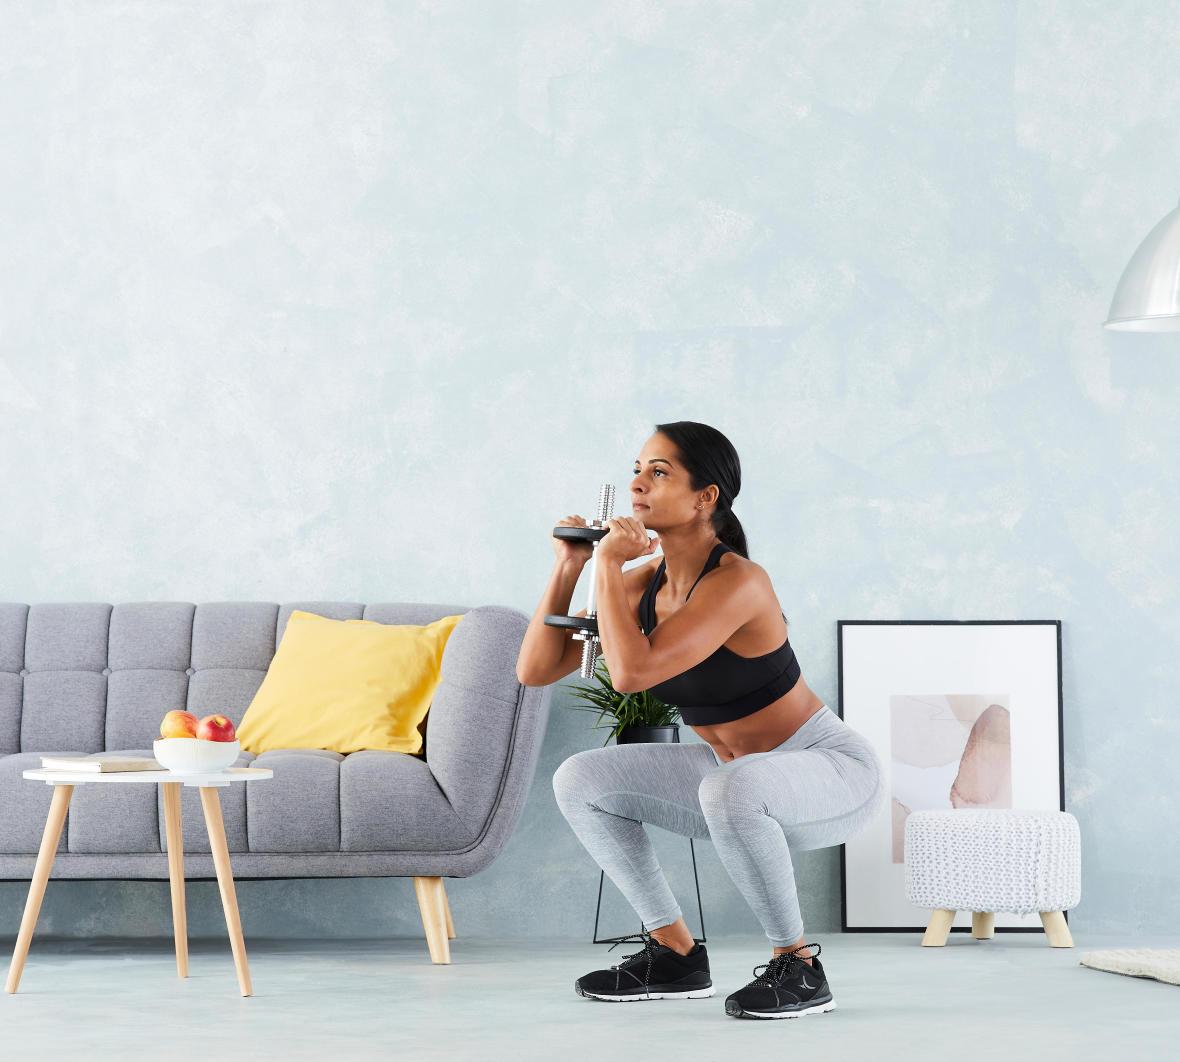 les différents types de squat